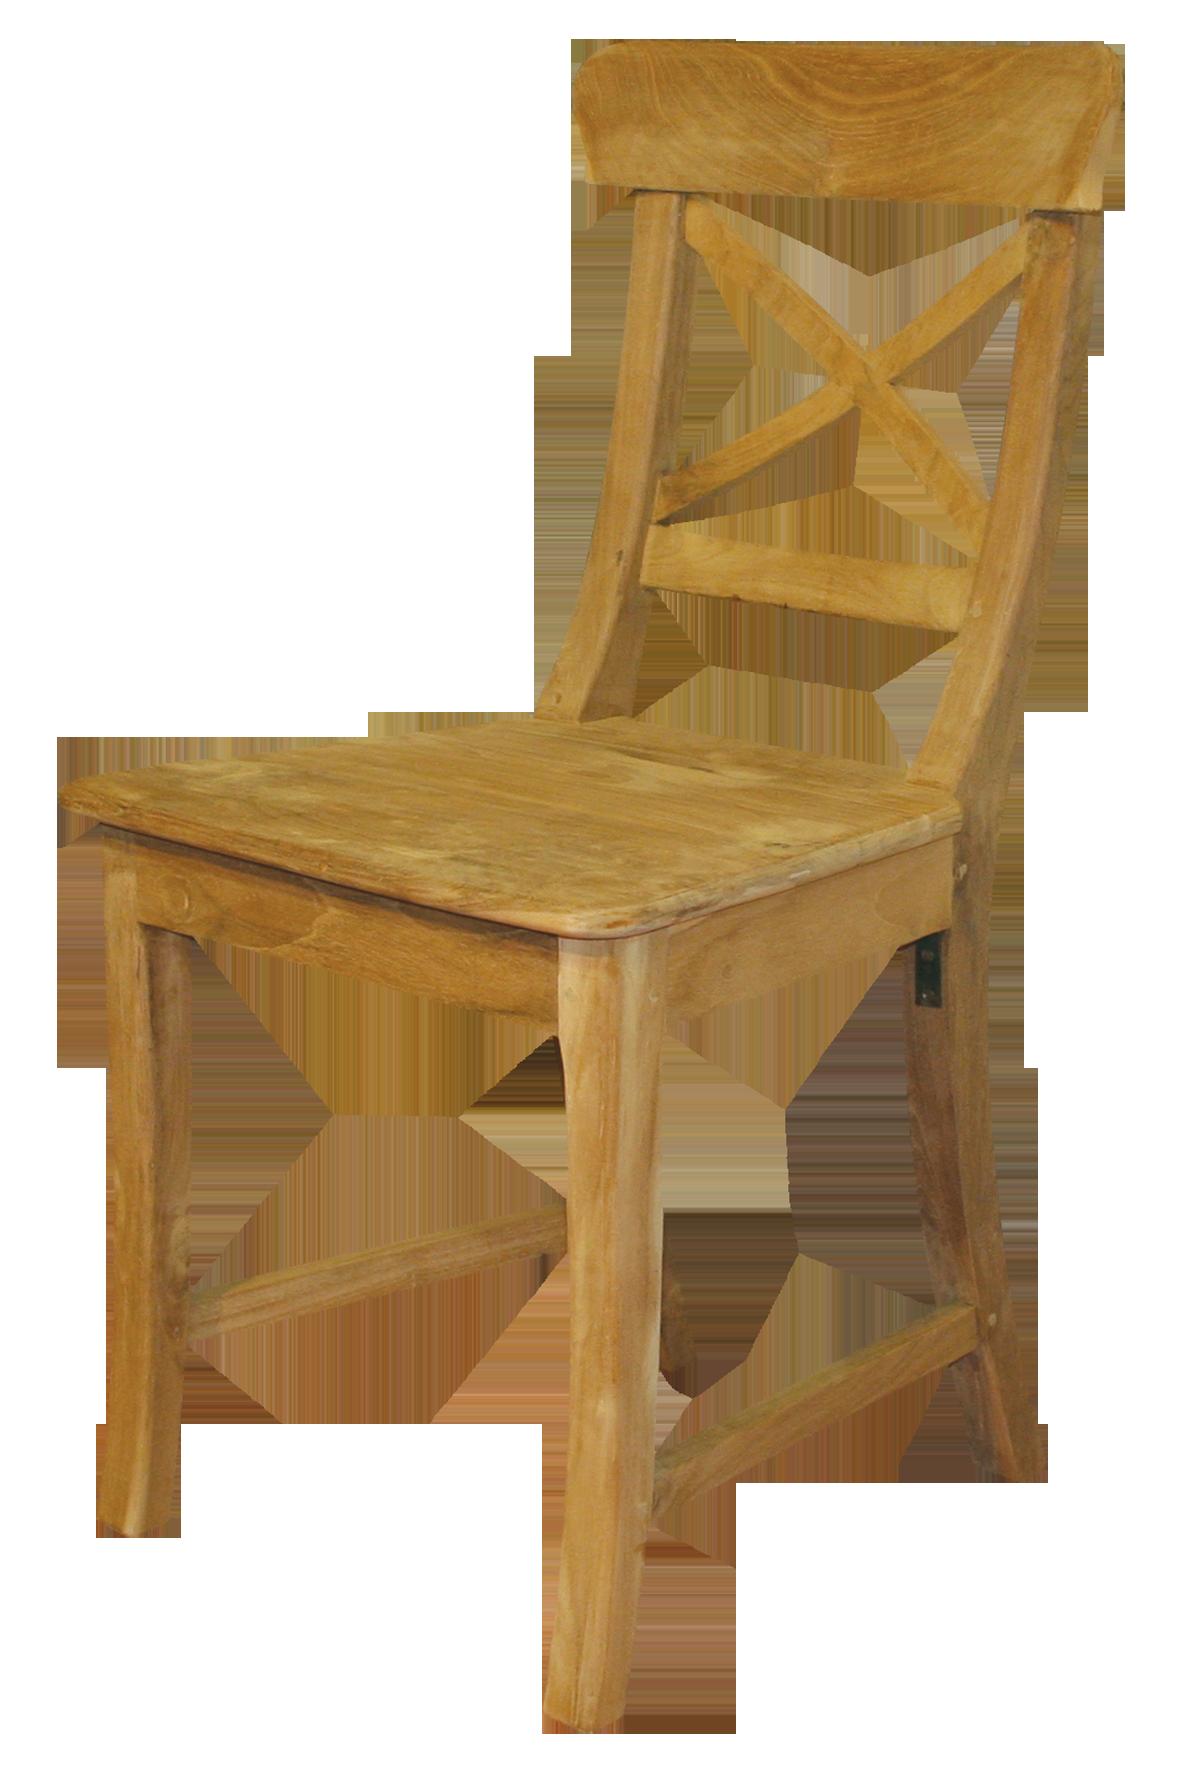 stuhl teak teakm bel esszimmer stuhl tisch und stuhl. Black Bedroom Furniture Sets. Home Design Ideas